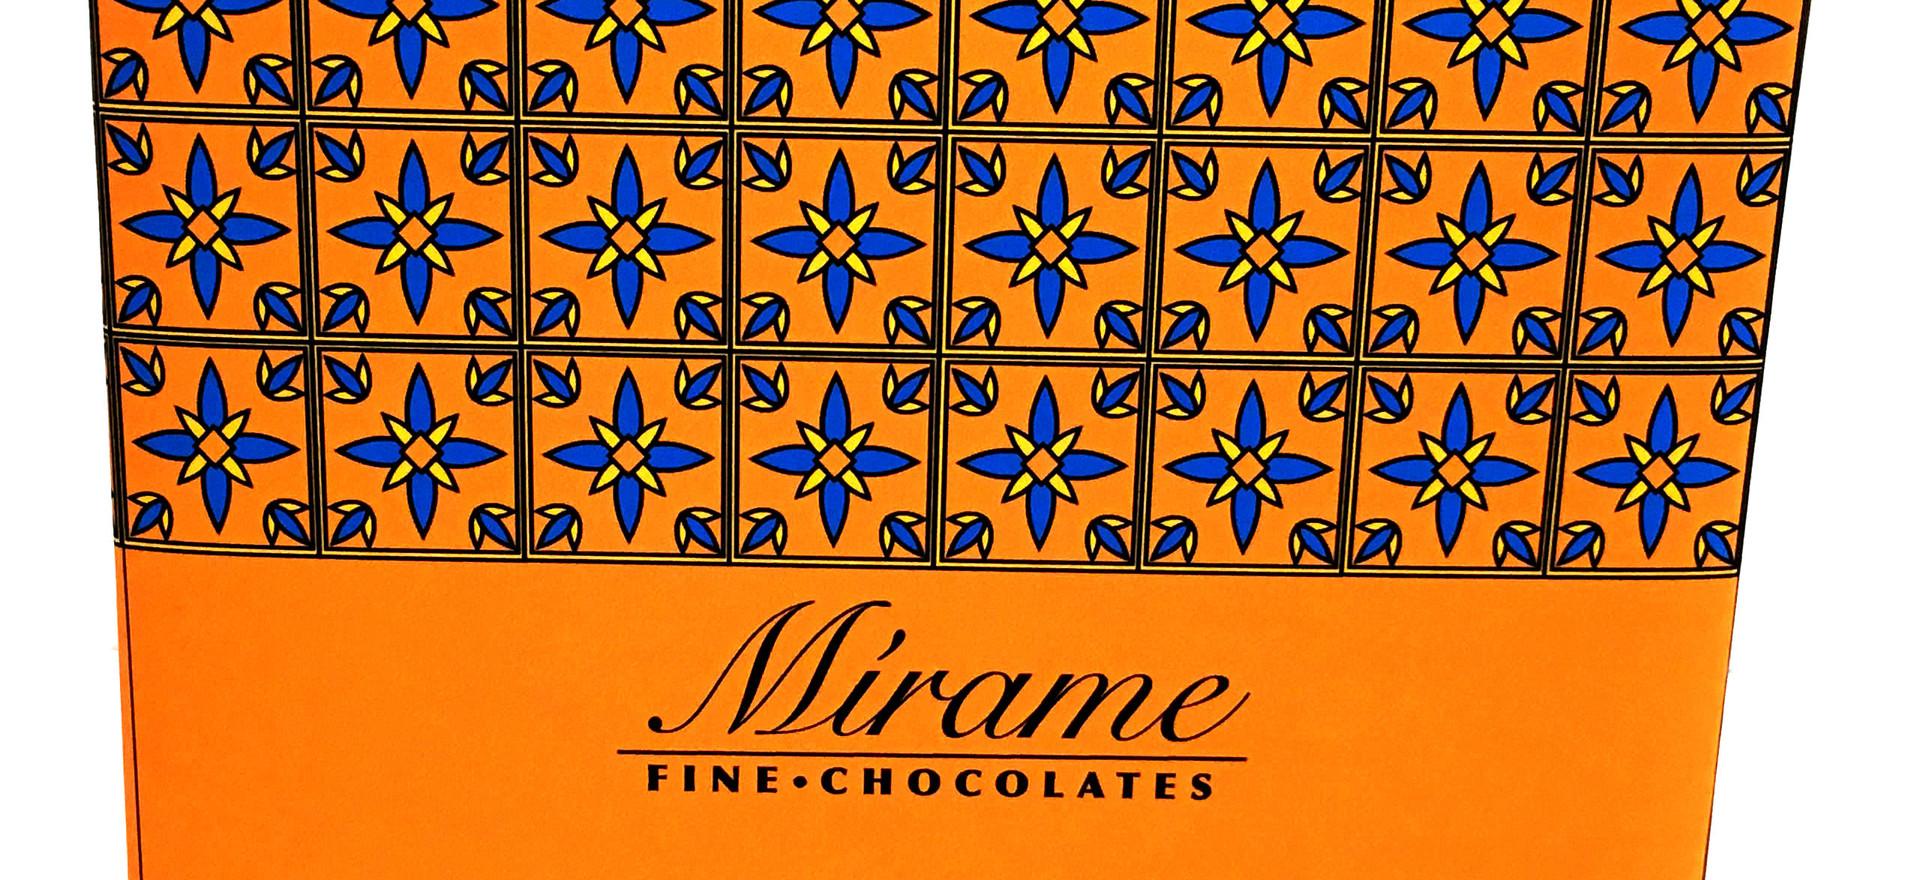 Concha de Chocolate Front.jpg